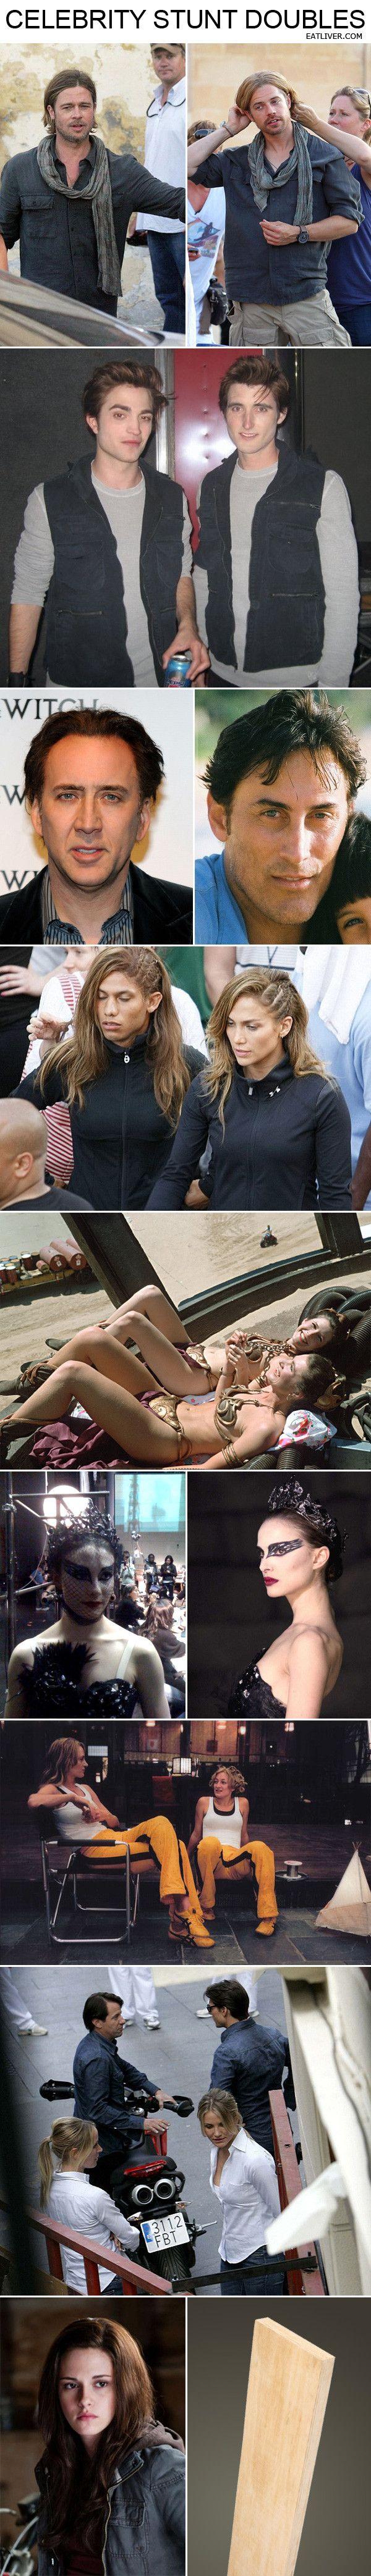 Celebrity stunt doubles. Bah ha ha ha ha...so true!